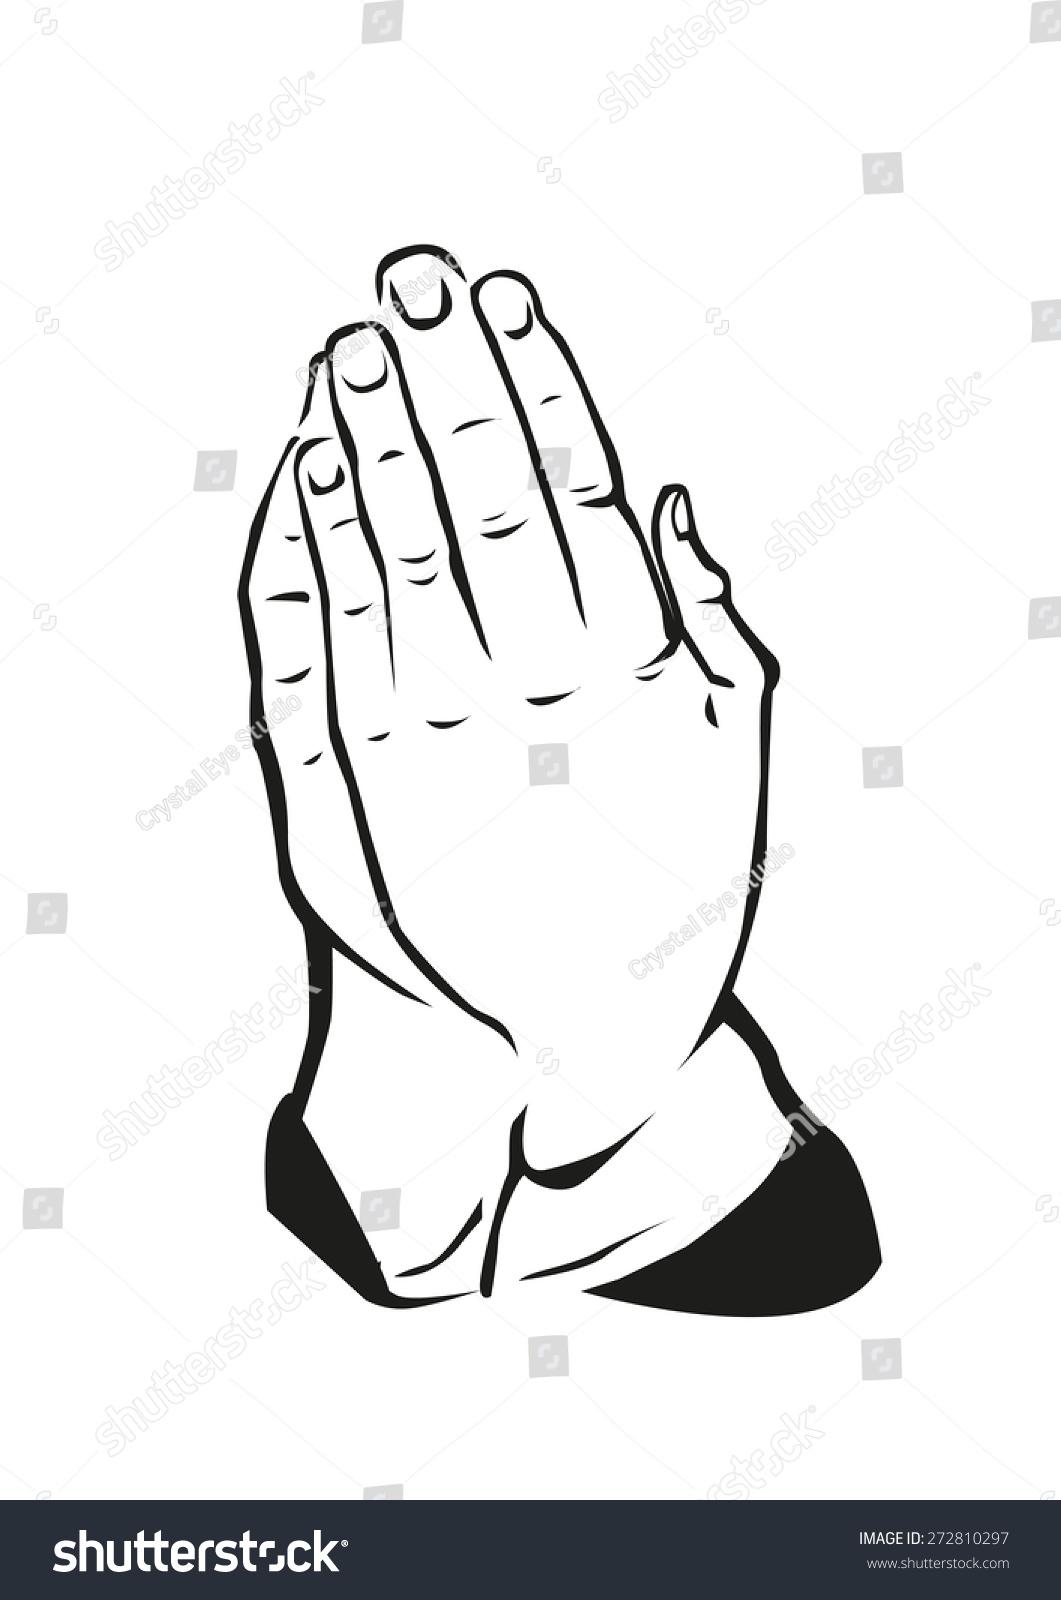 Hand praying position cultural greeting form stock vector 272810297 hand in praying position or in cultural greeting form like in thailands sawasdee hindus namaste kristyandbryce Choice Image